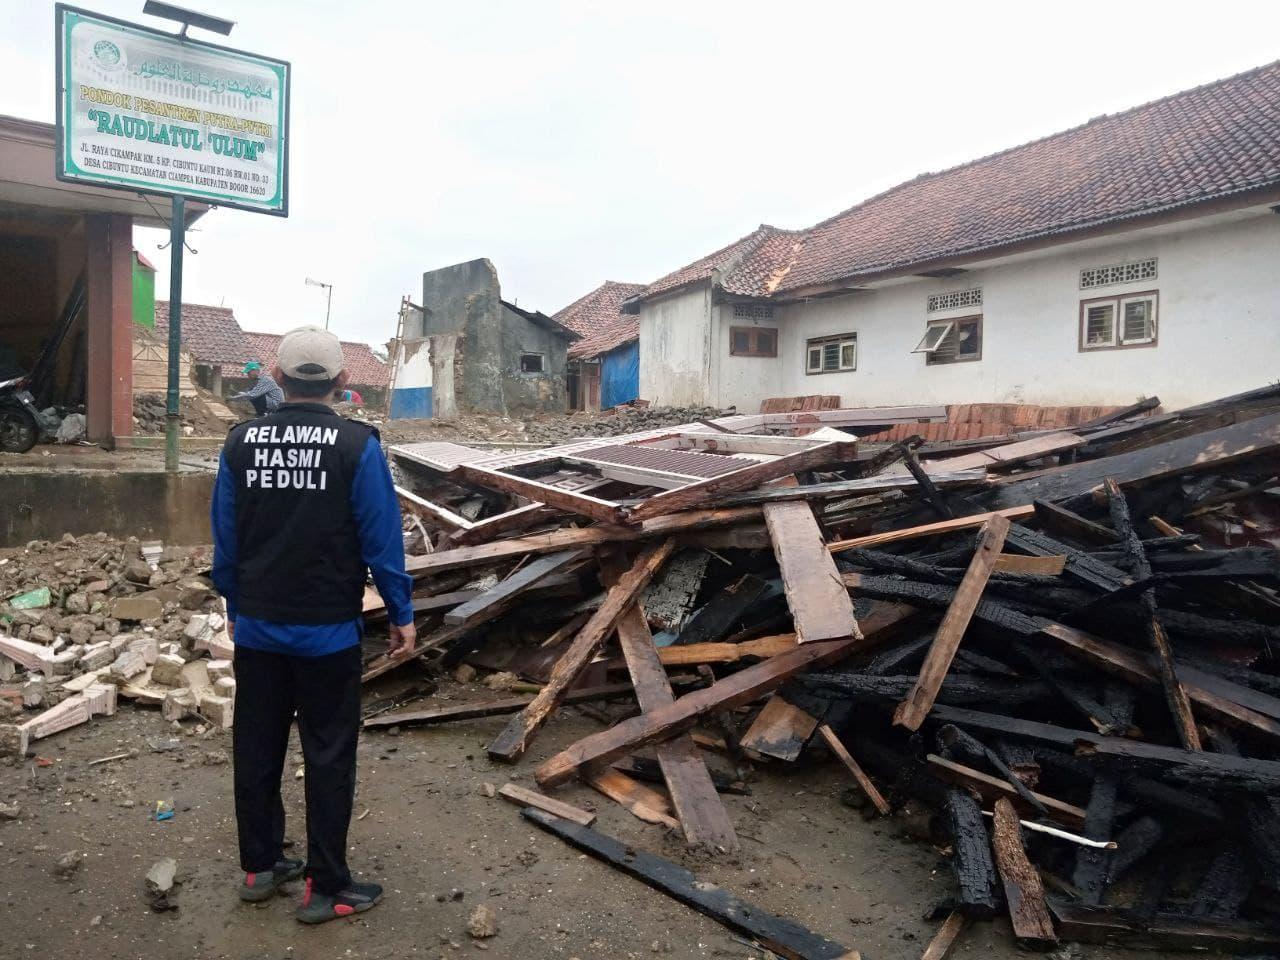 Bantuan untuk Korban Kebakaran Ponpes Raudhatul Ulum Kab. Bogor